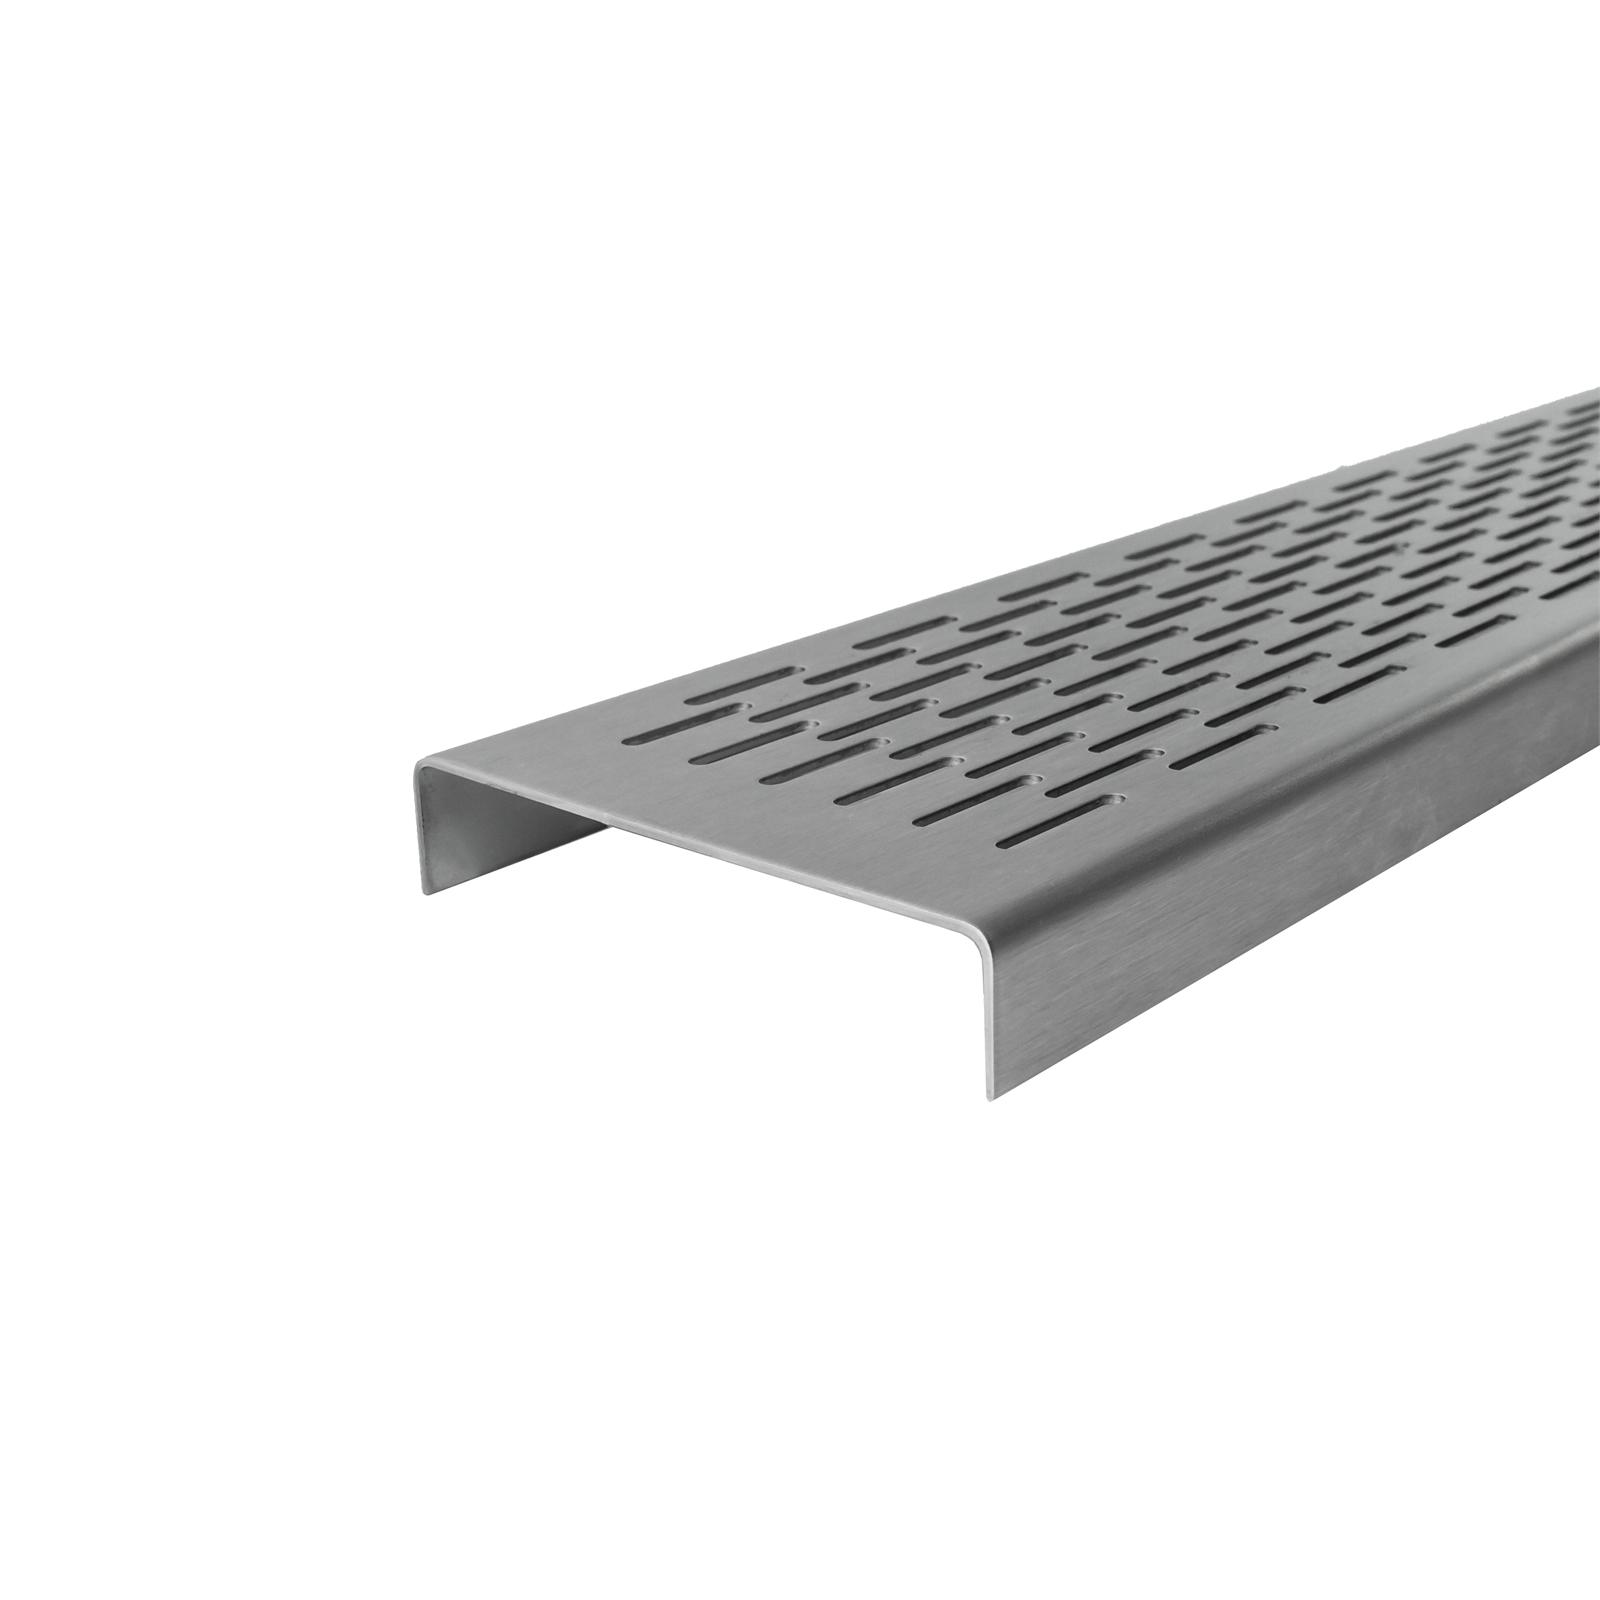 Grates 2 Go 1500mm Brick Pattern Shower Modular - Grate Only